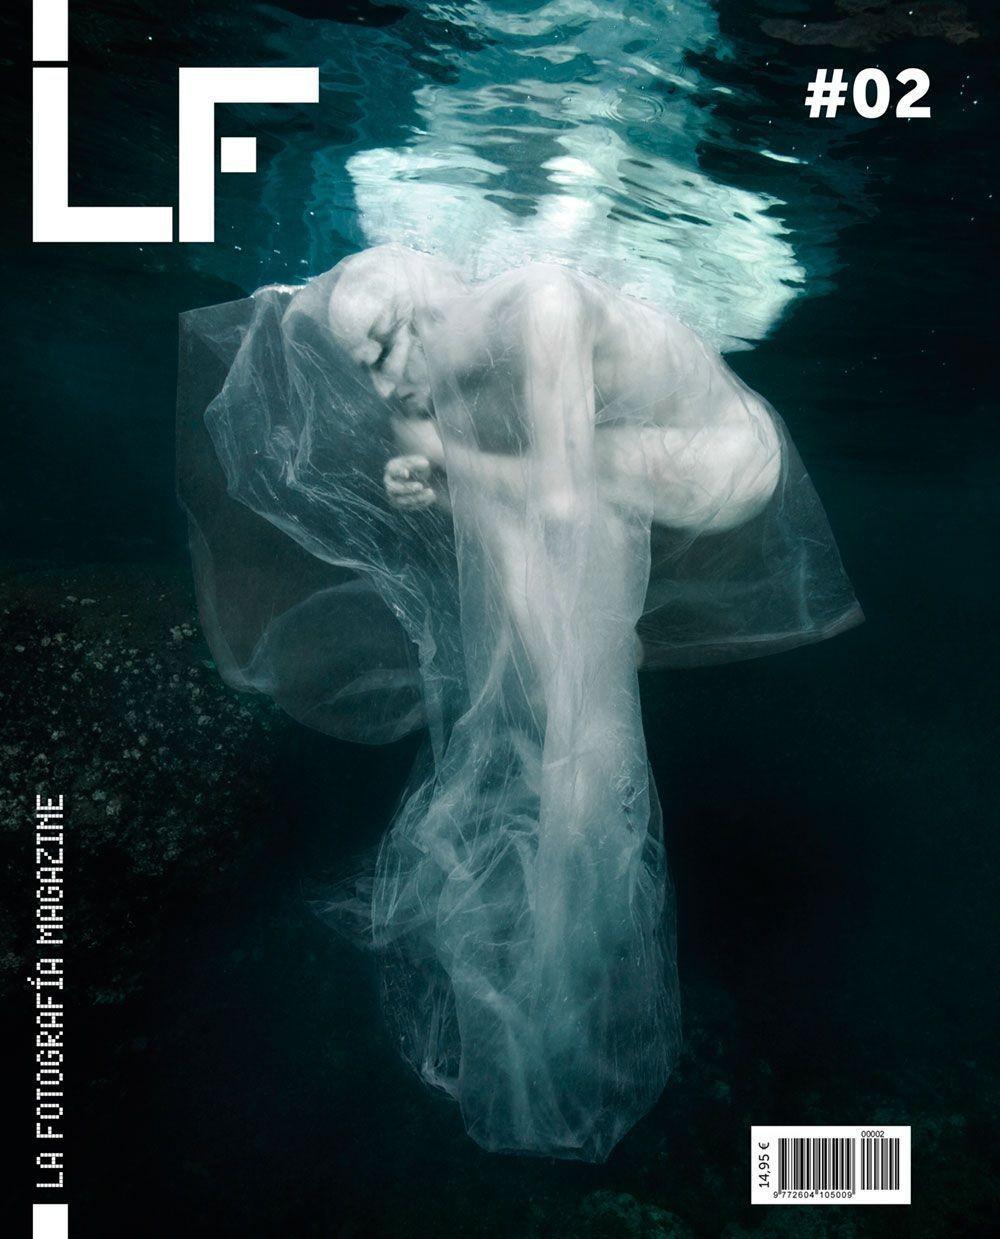 La Fotografía Magazine Nº 2